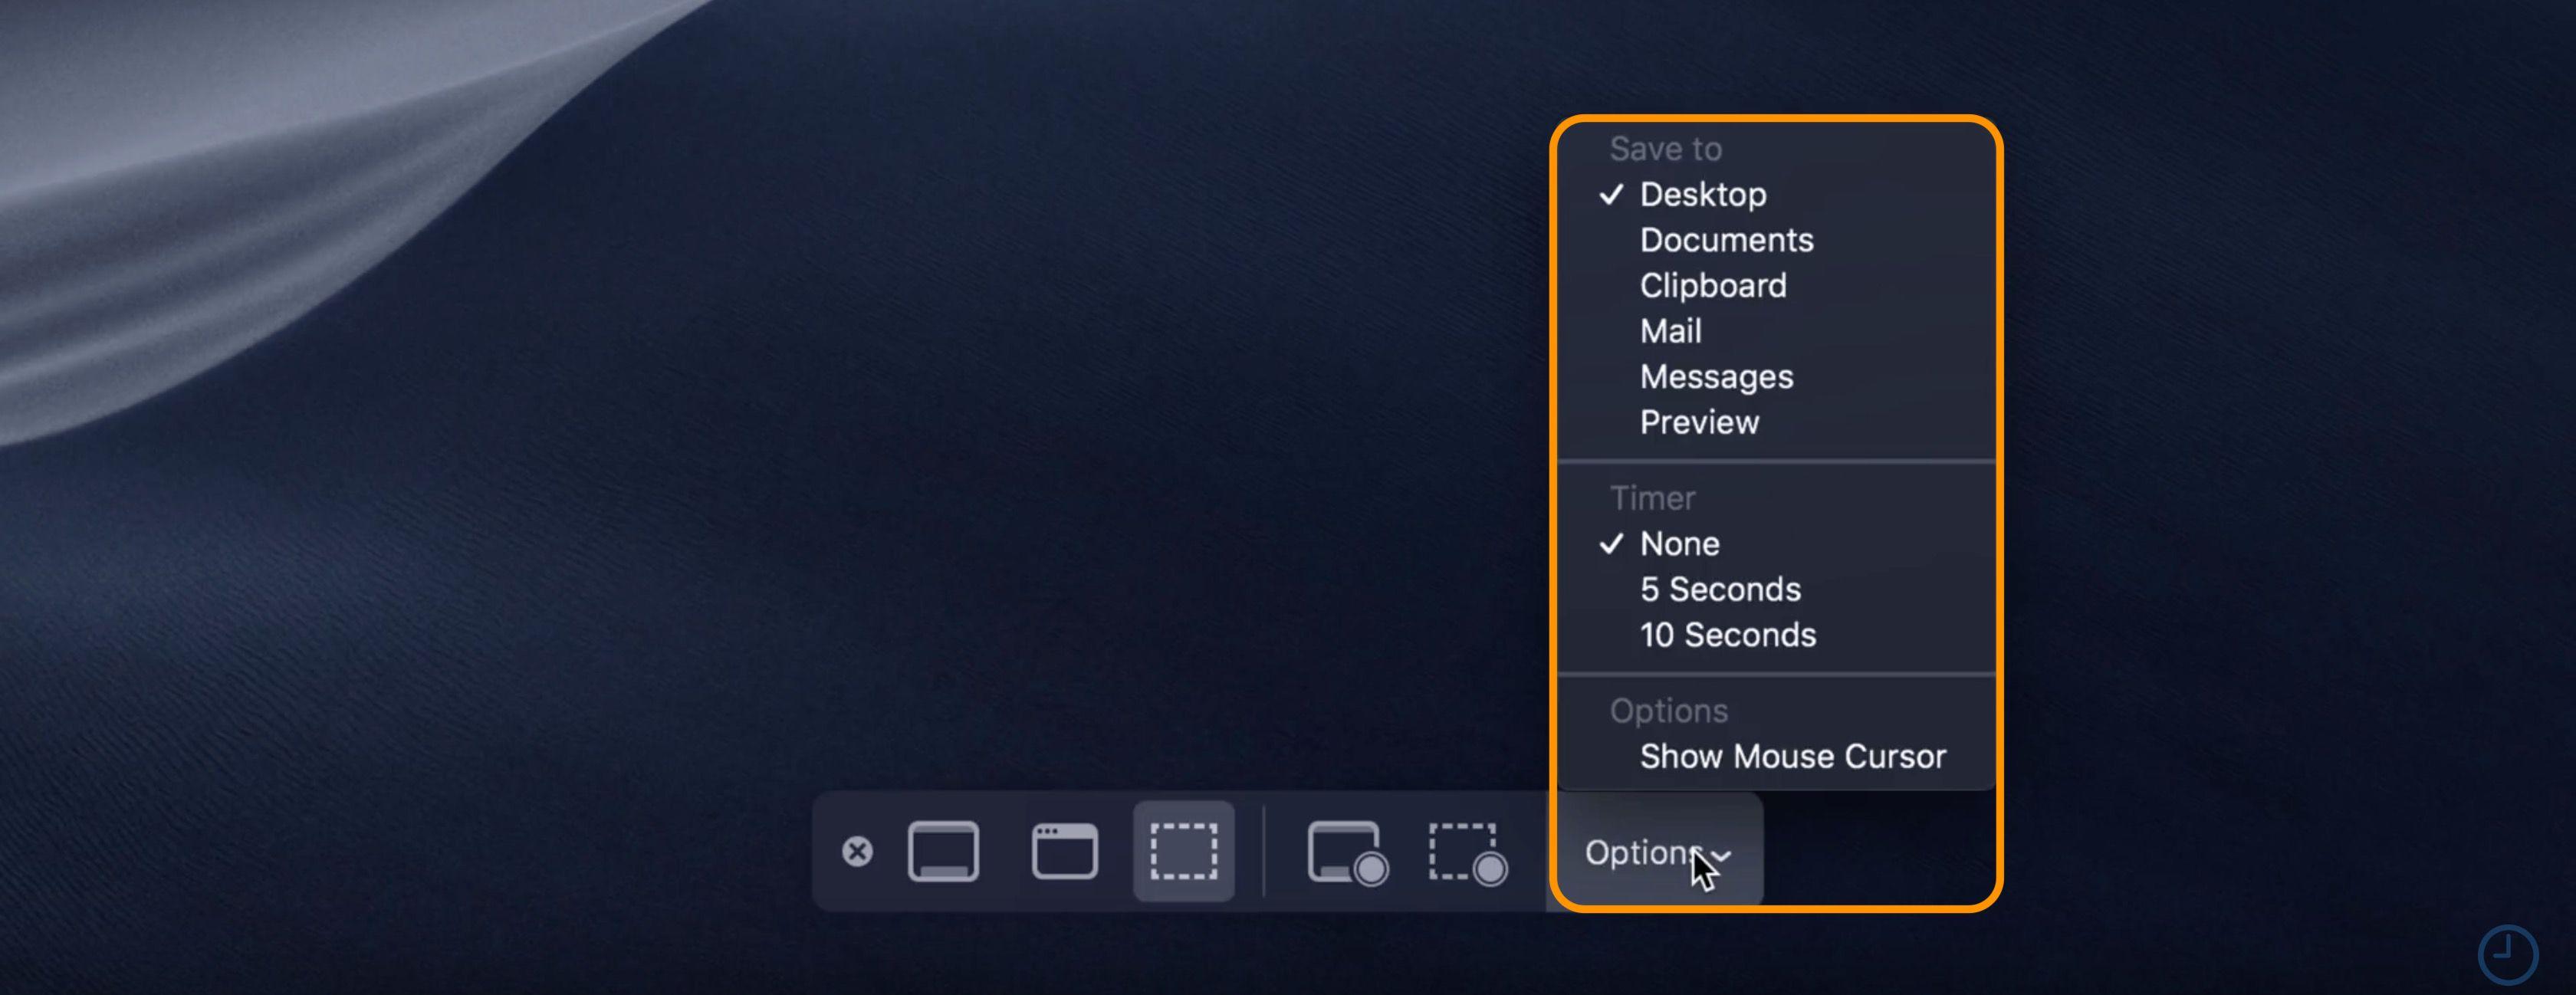 macOS Mojave: How to use new screenshot and screencast tools